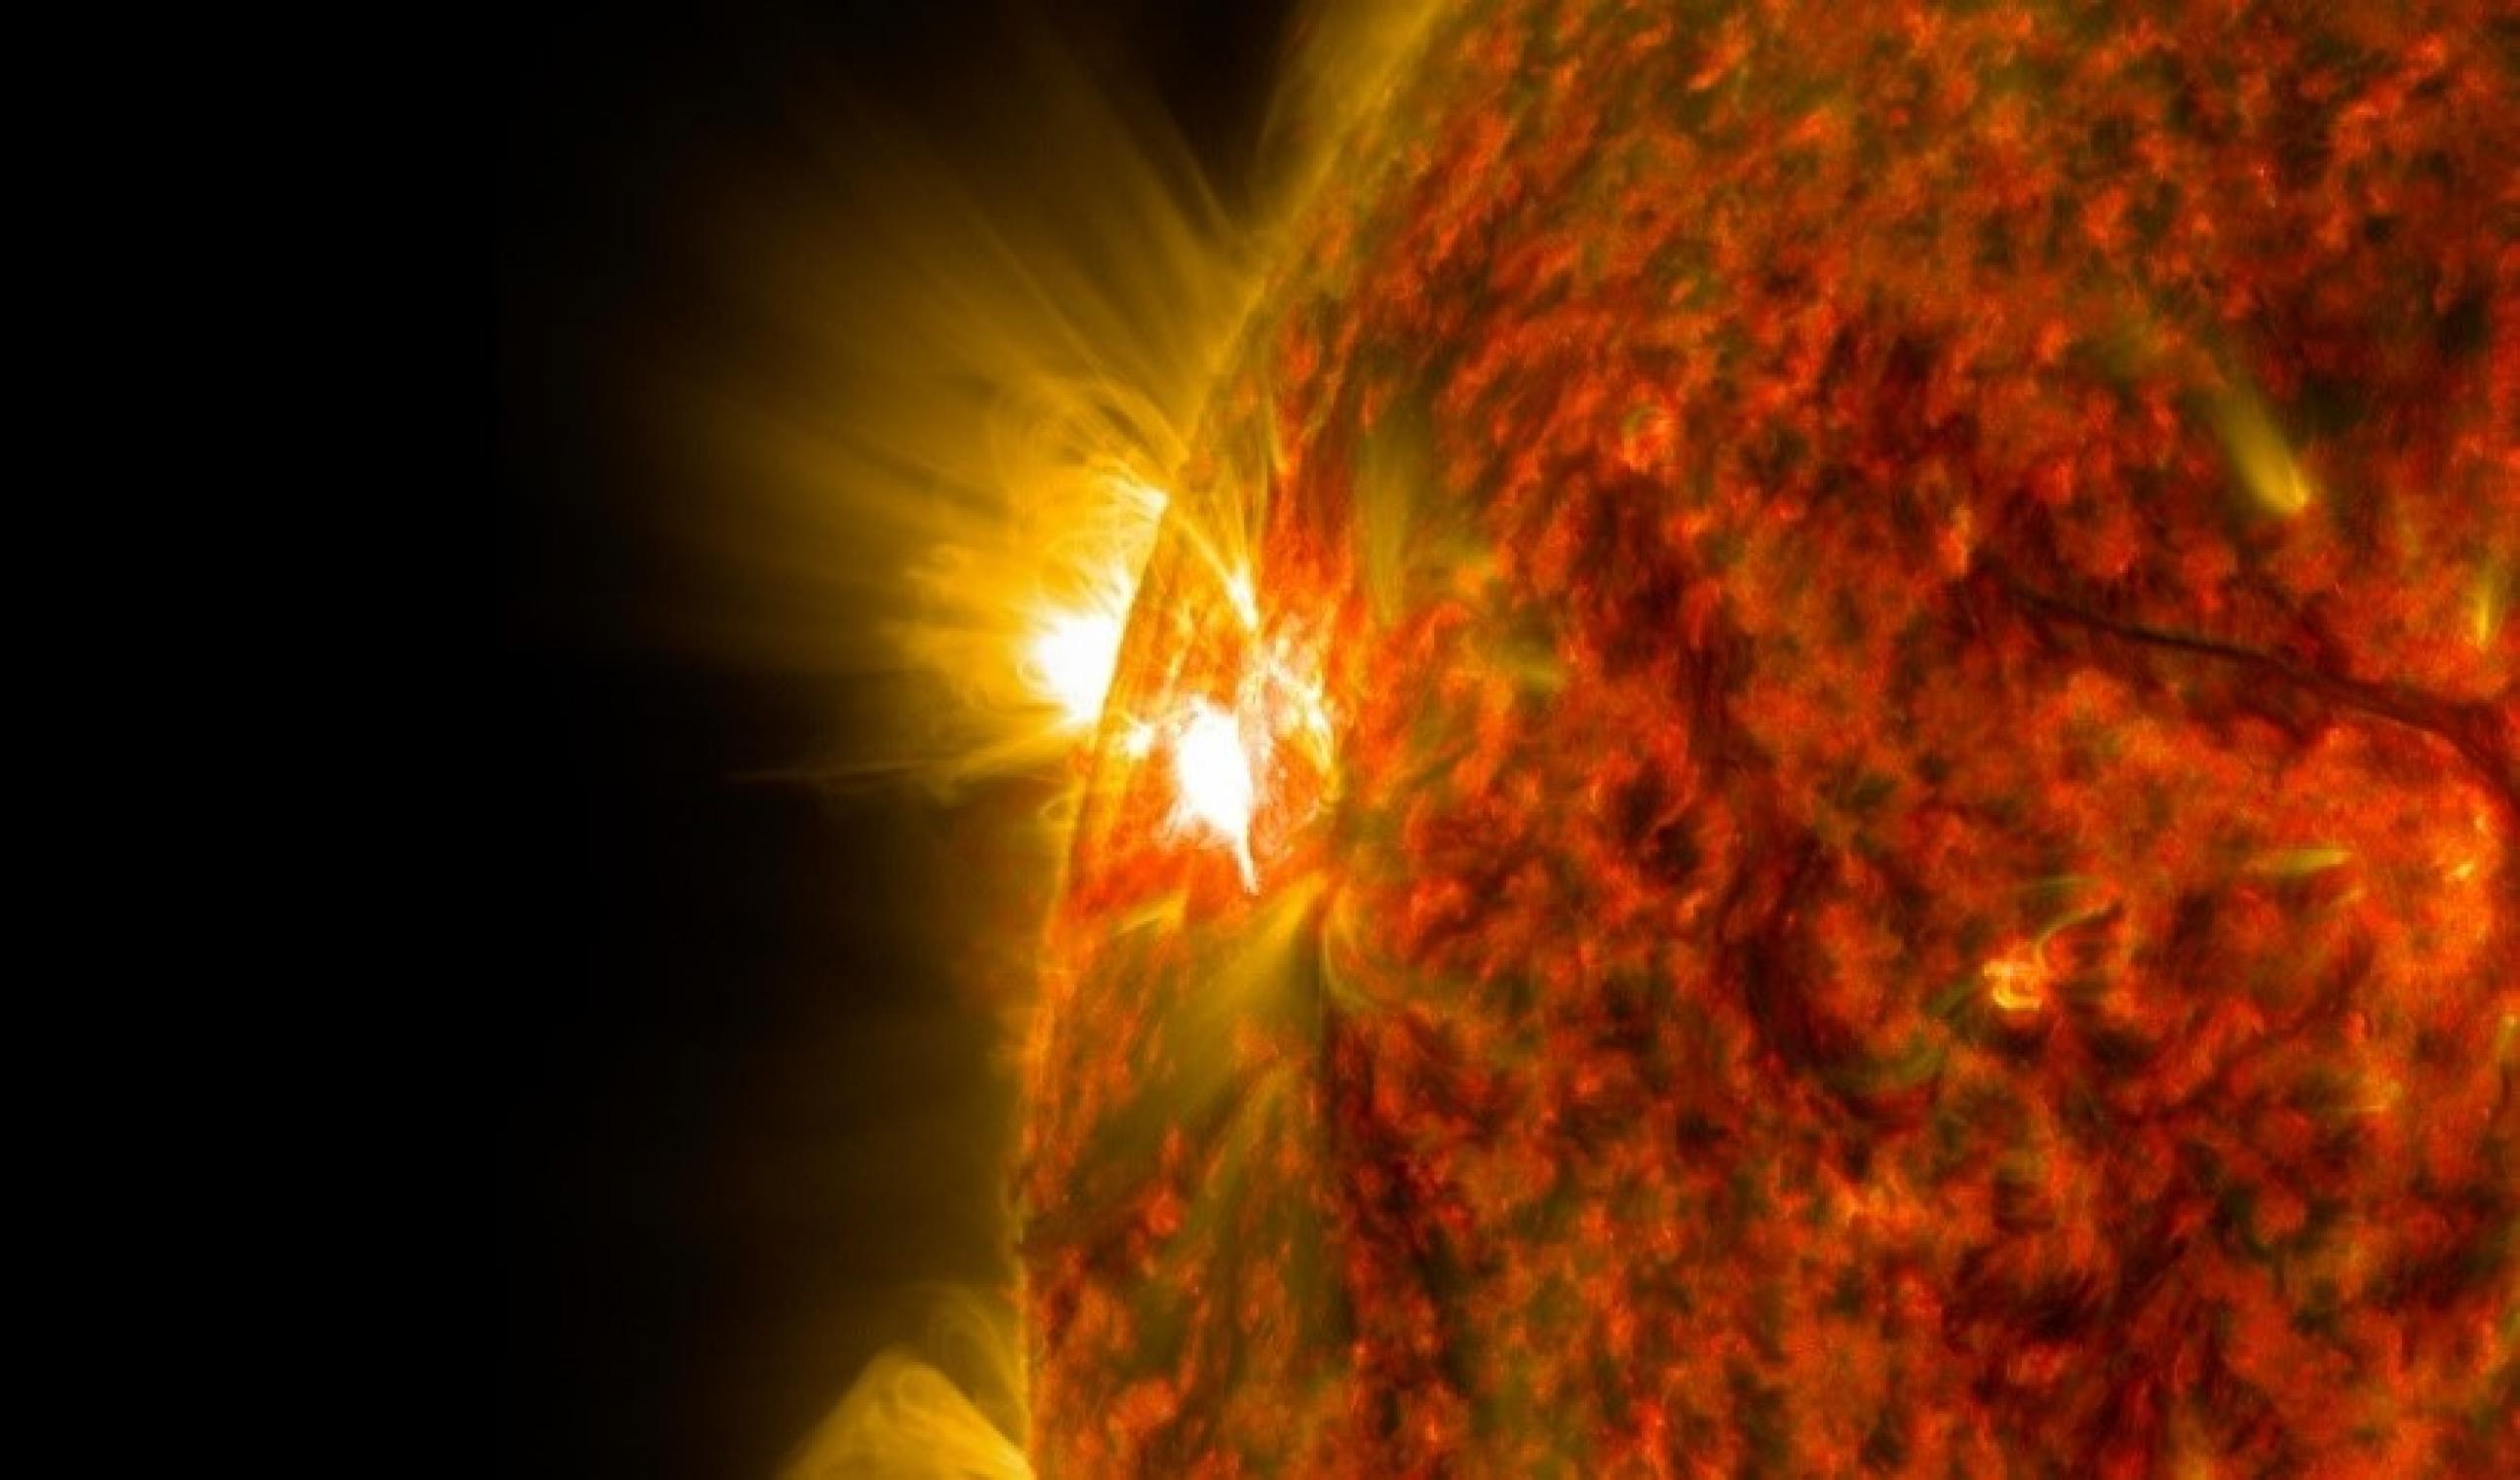 Mid-level flare eruption on the sun